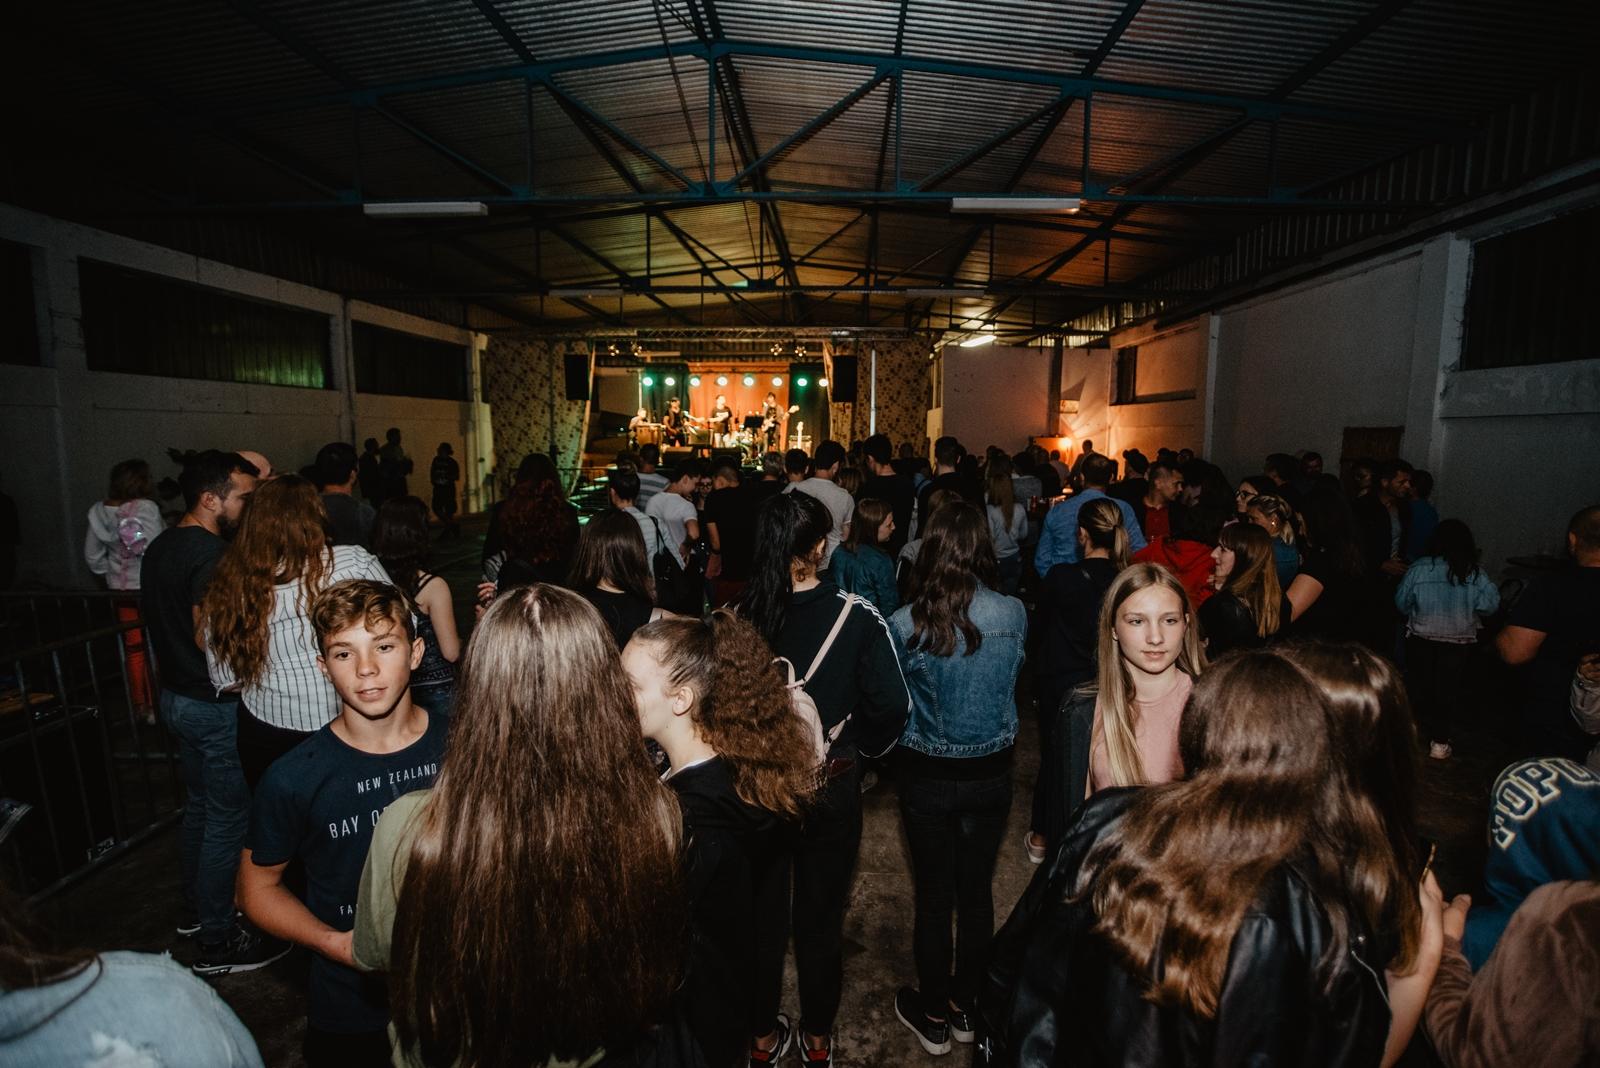 likaclub_korenica_neno-belan_2019-14